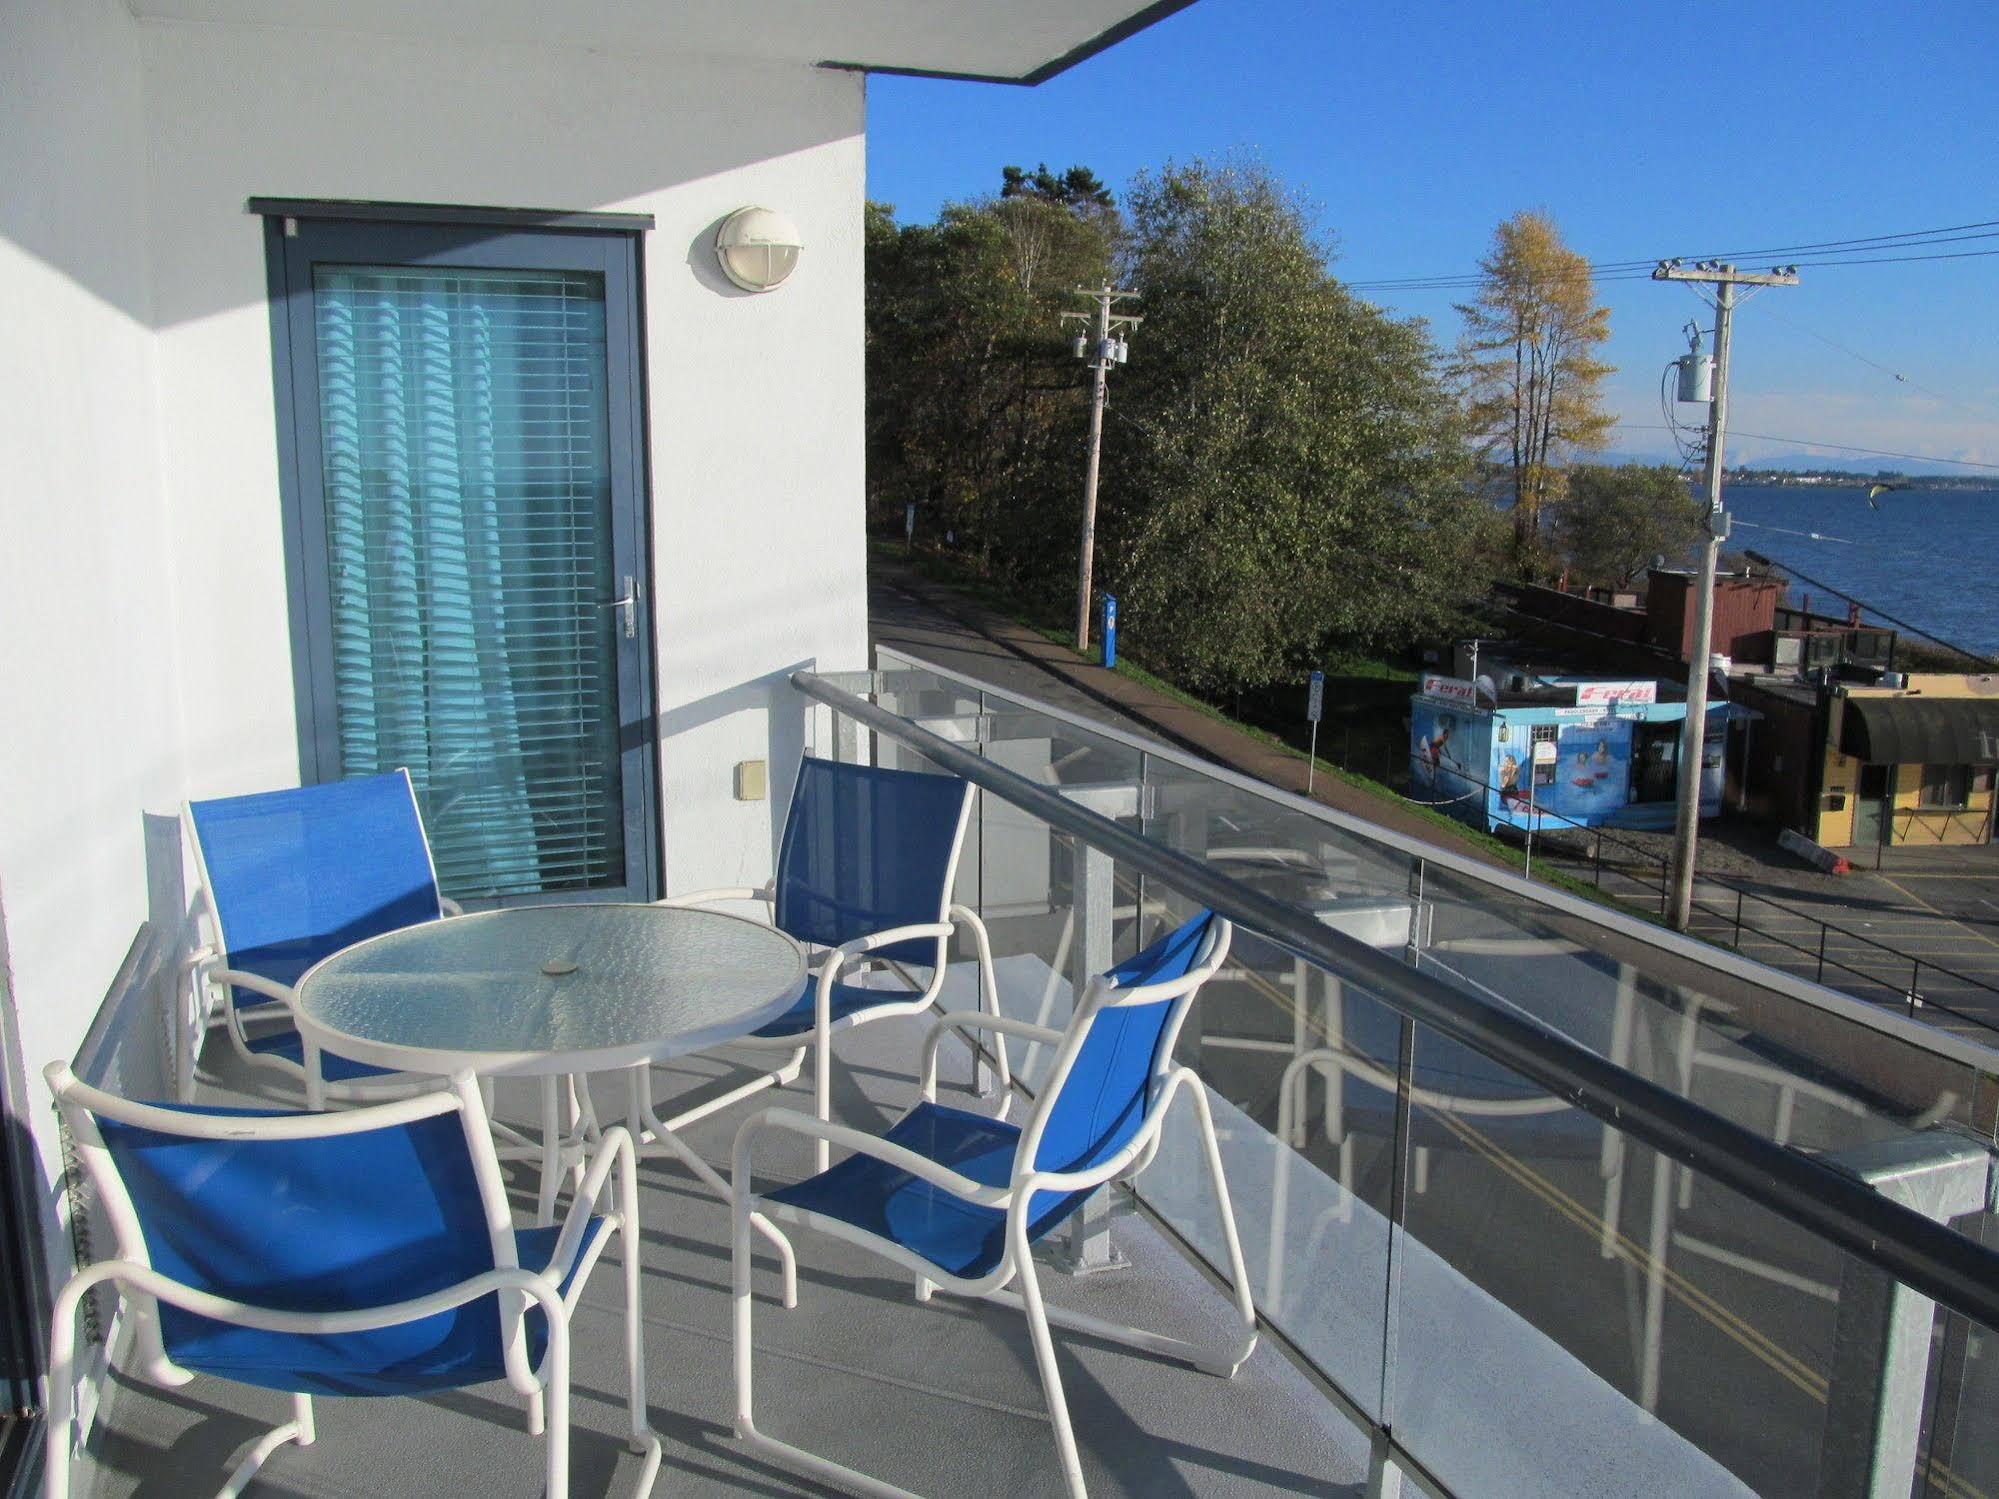 Your oceanside getaway is just around the corner at the ocean promenade hotel in white rock. Ocean Promenade Hotel